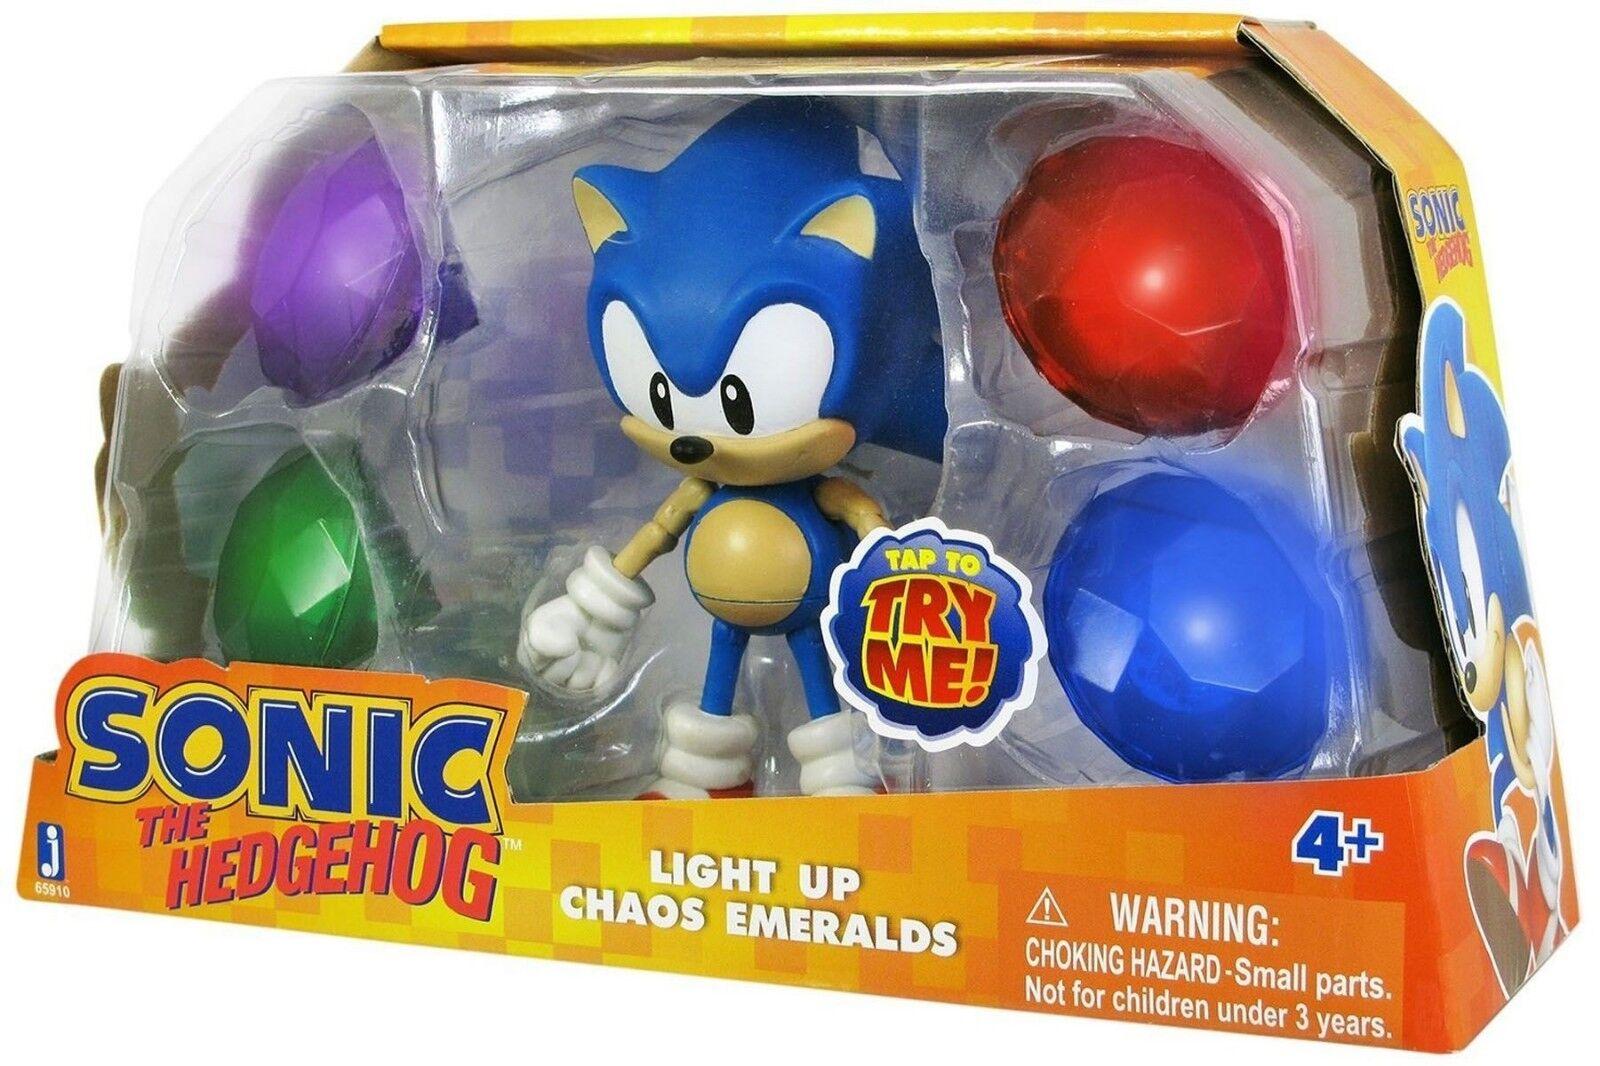 Sonic the hedgehog w   chaos smaragde (4  action figure set)